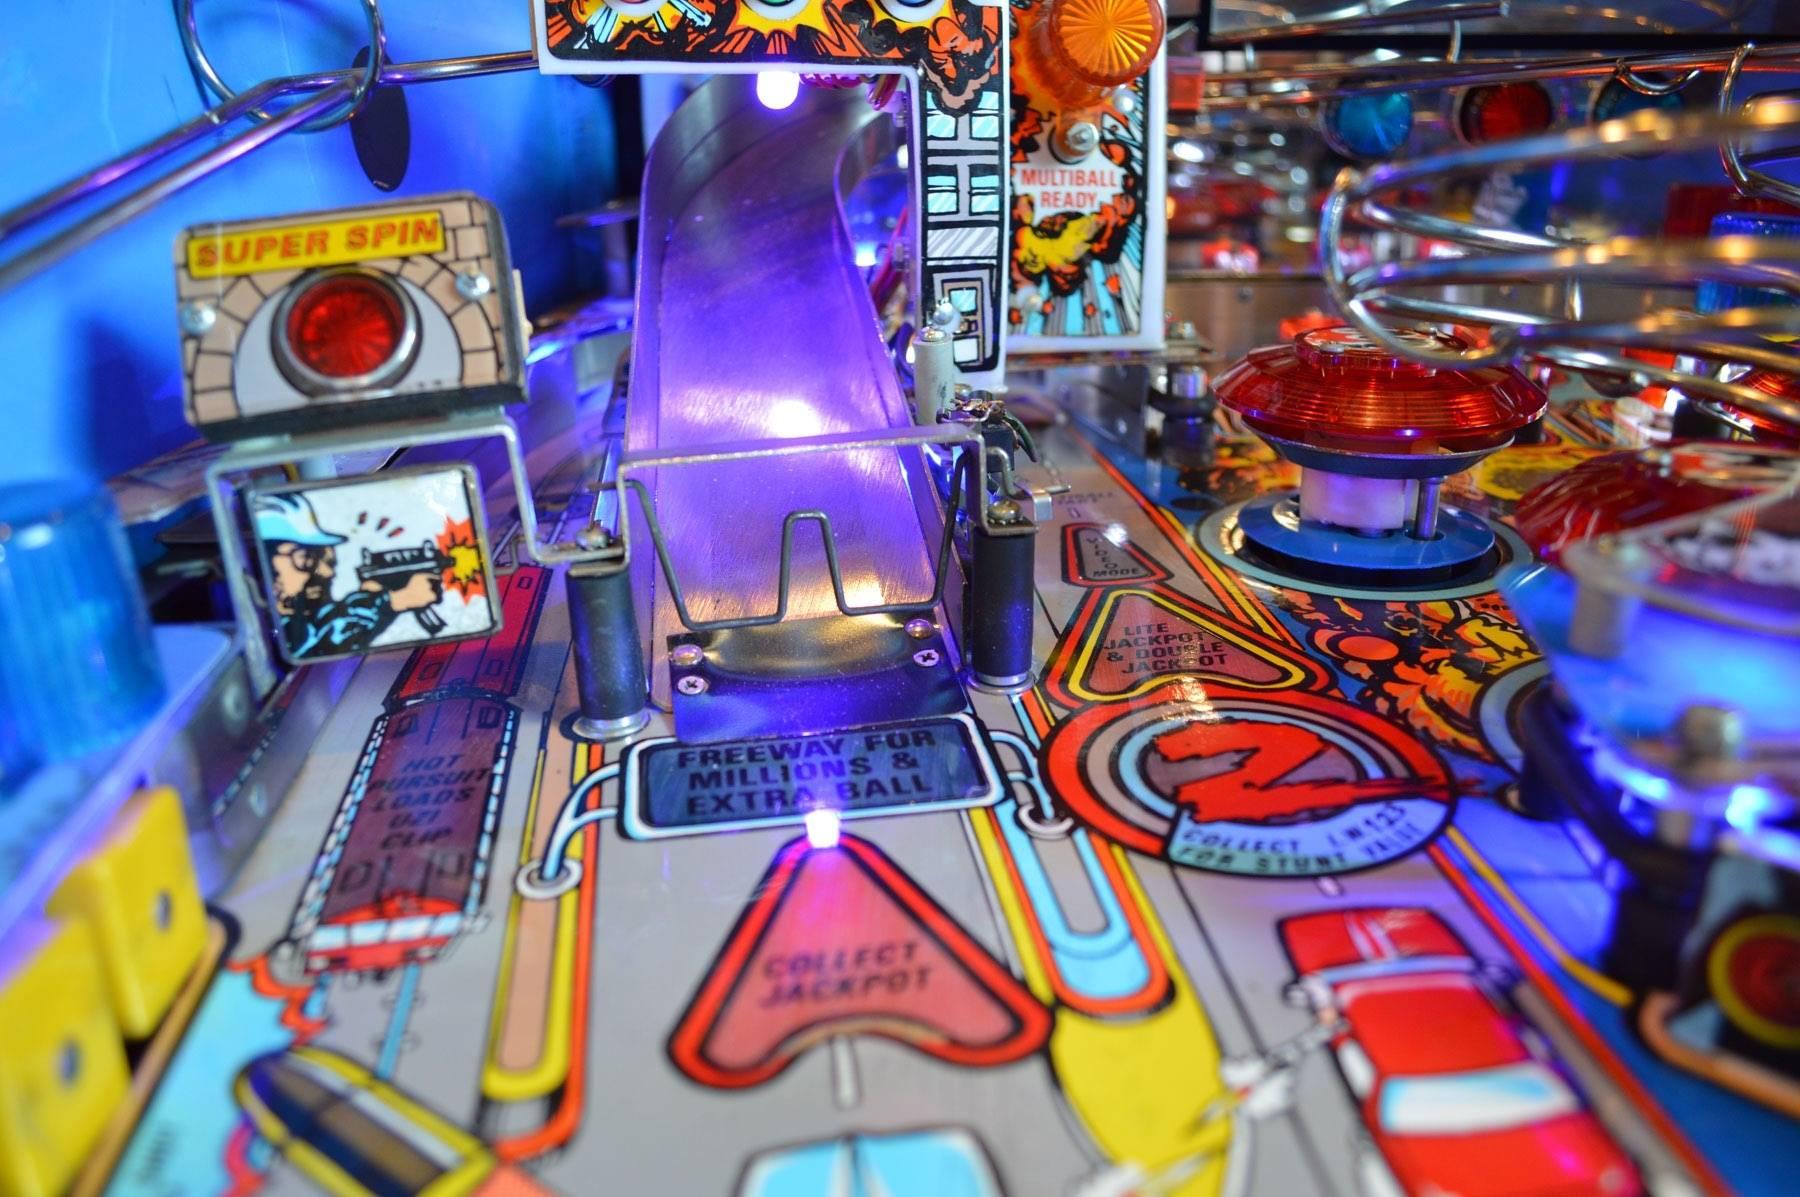 lethal weapon 3 pinball machine